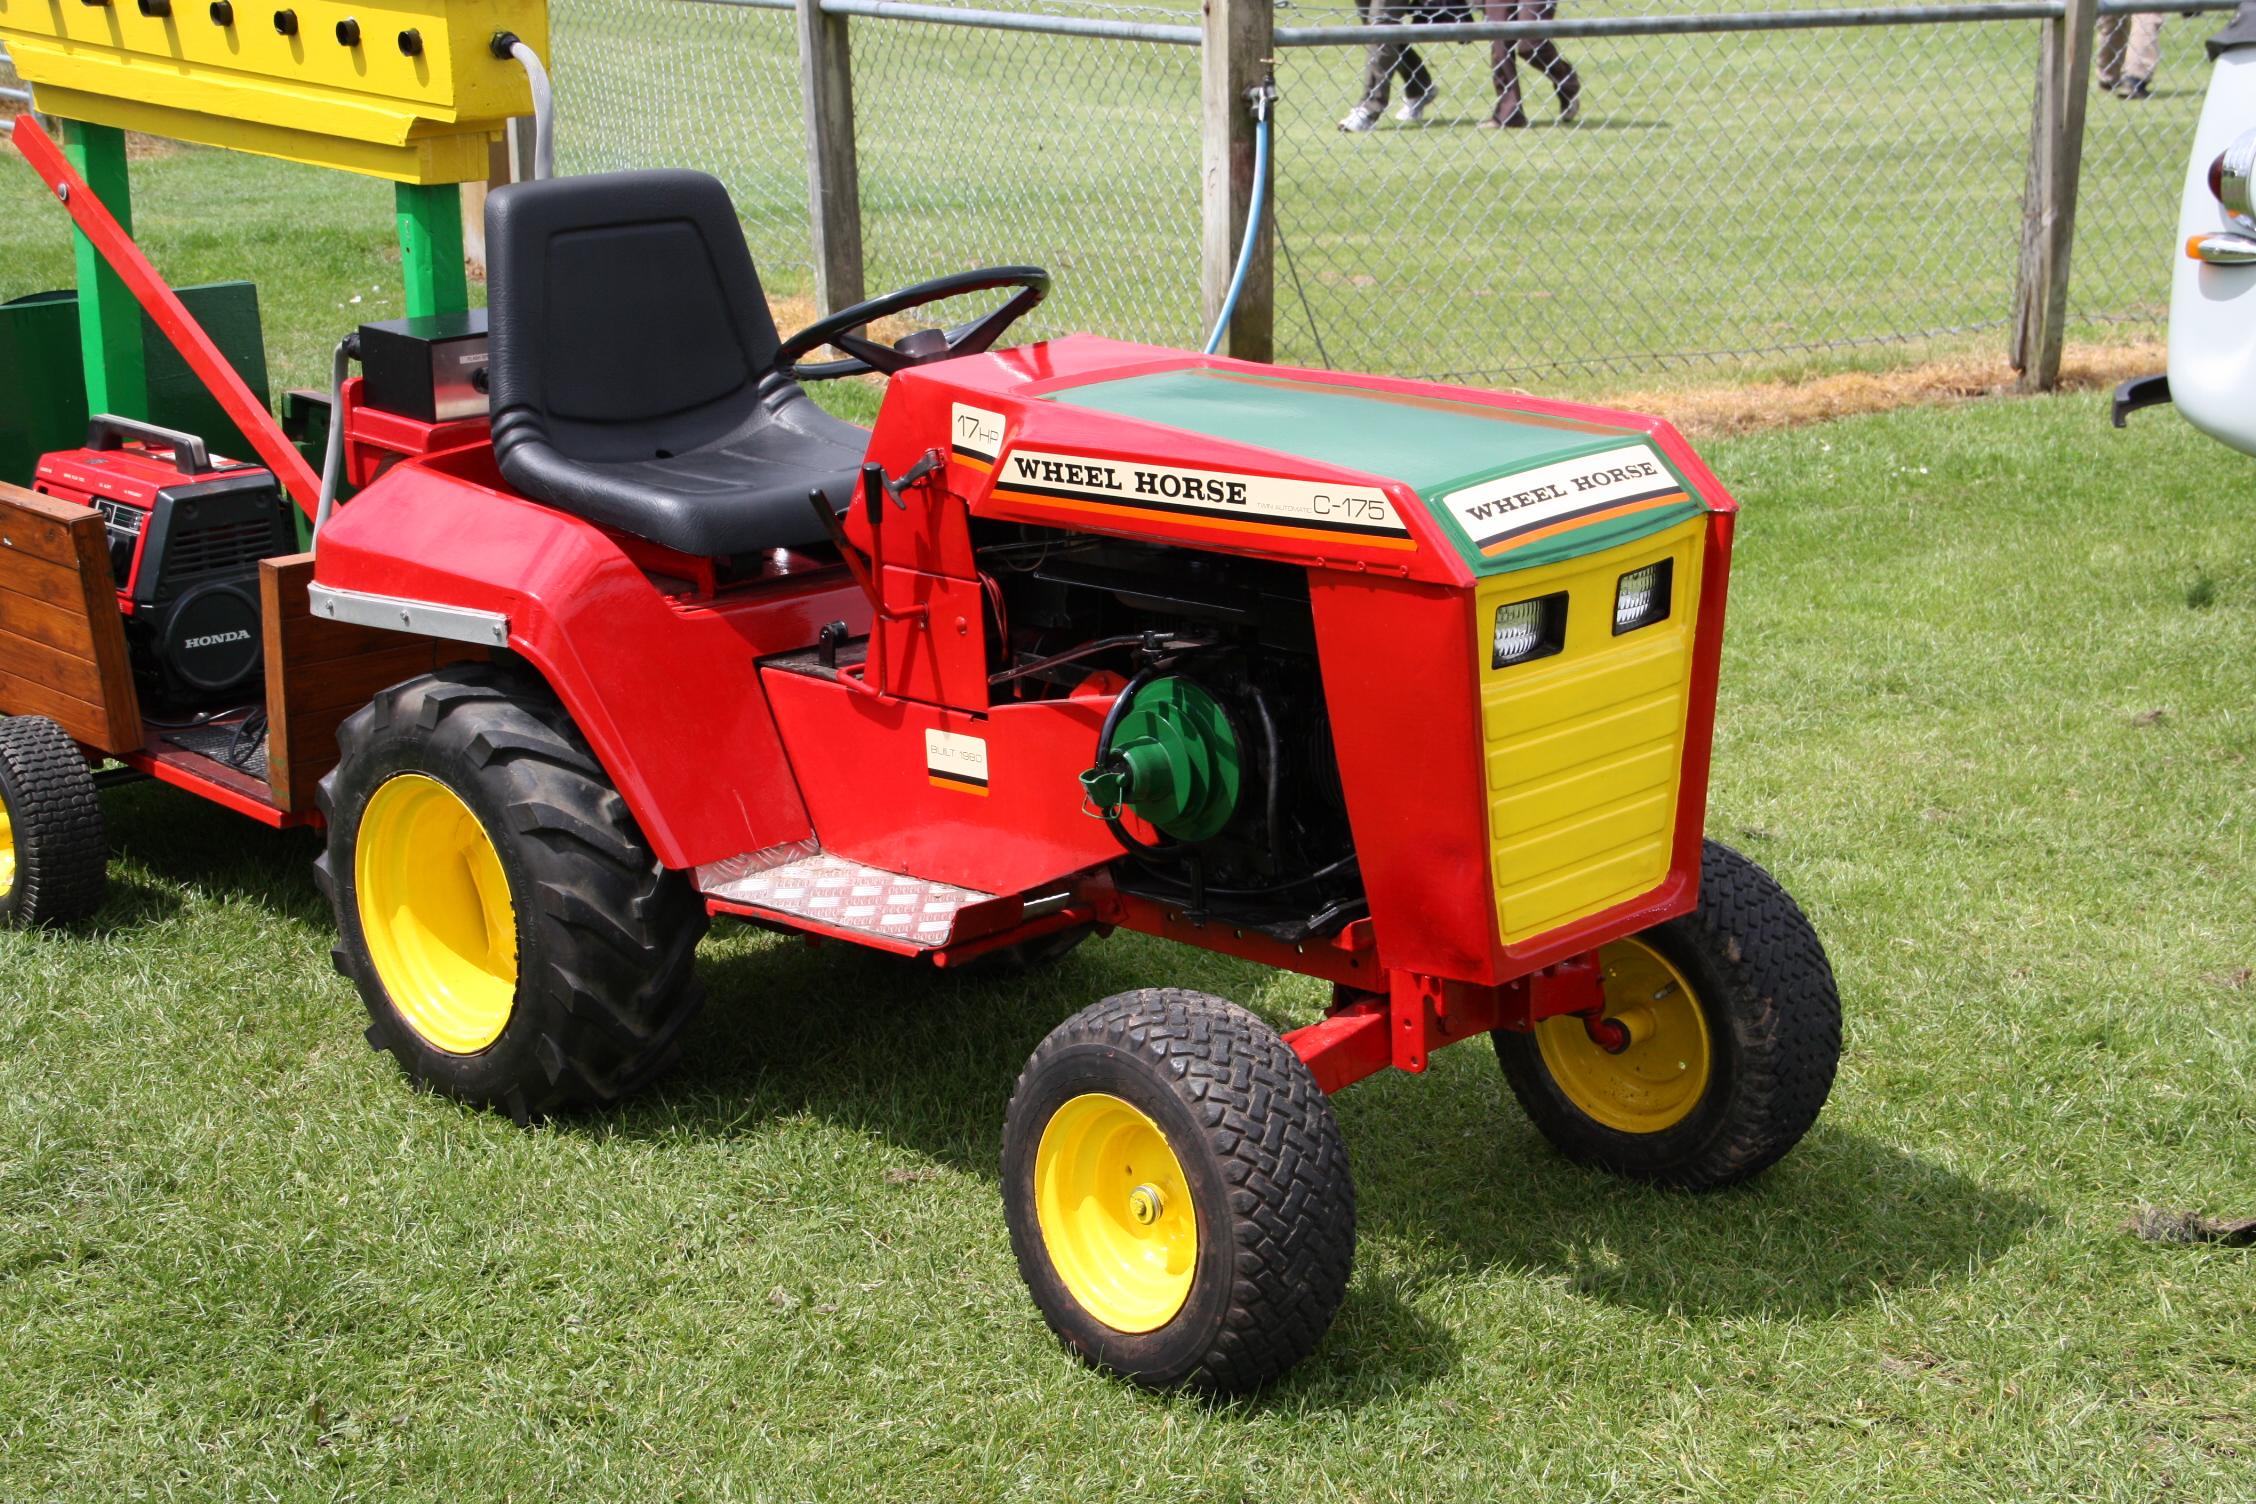 Wheel Horse Tractors : Wheel horse tractors tractor construction plant wiki